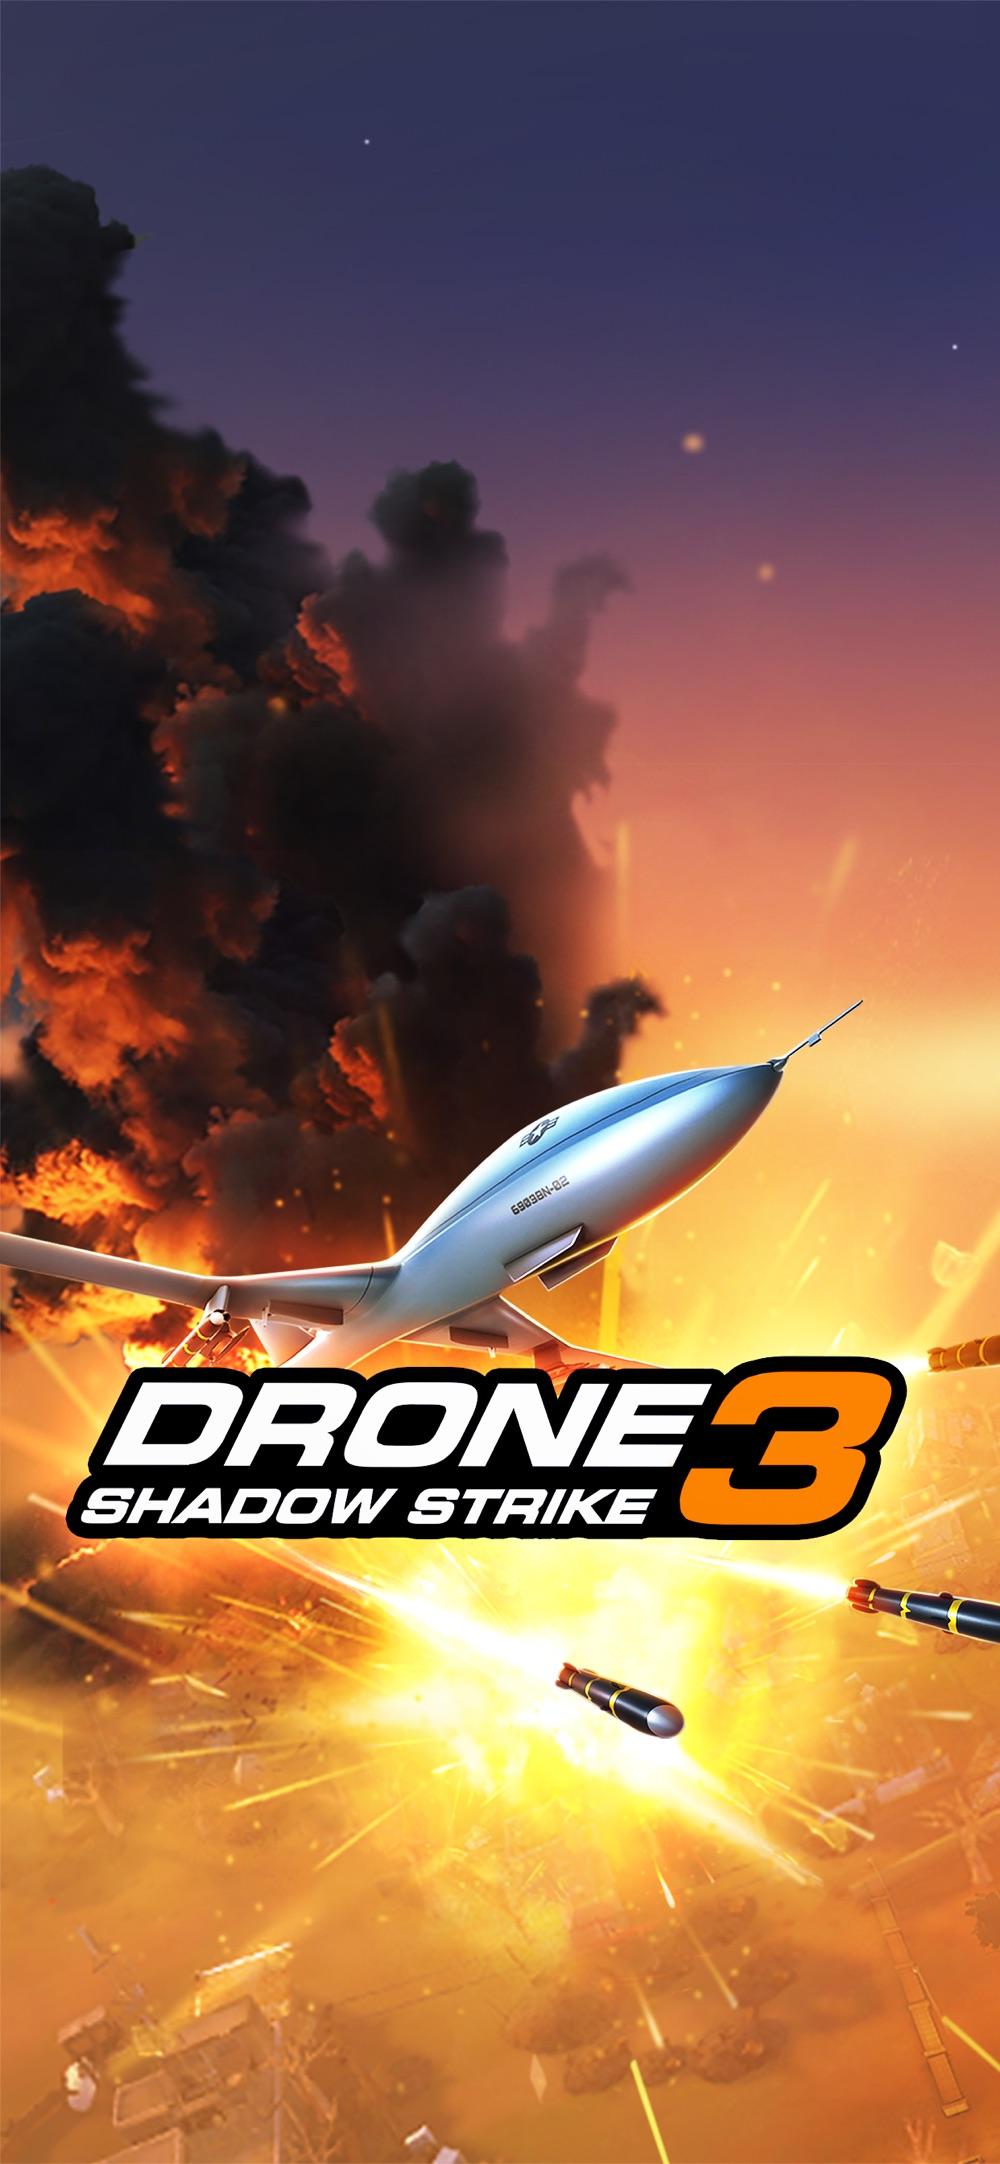 Drone : Shadow Strike 3 Cheat Codes